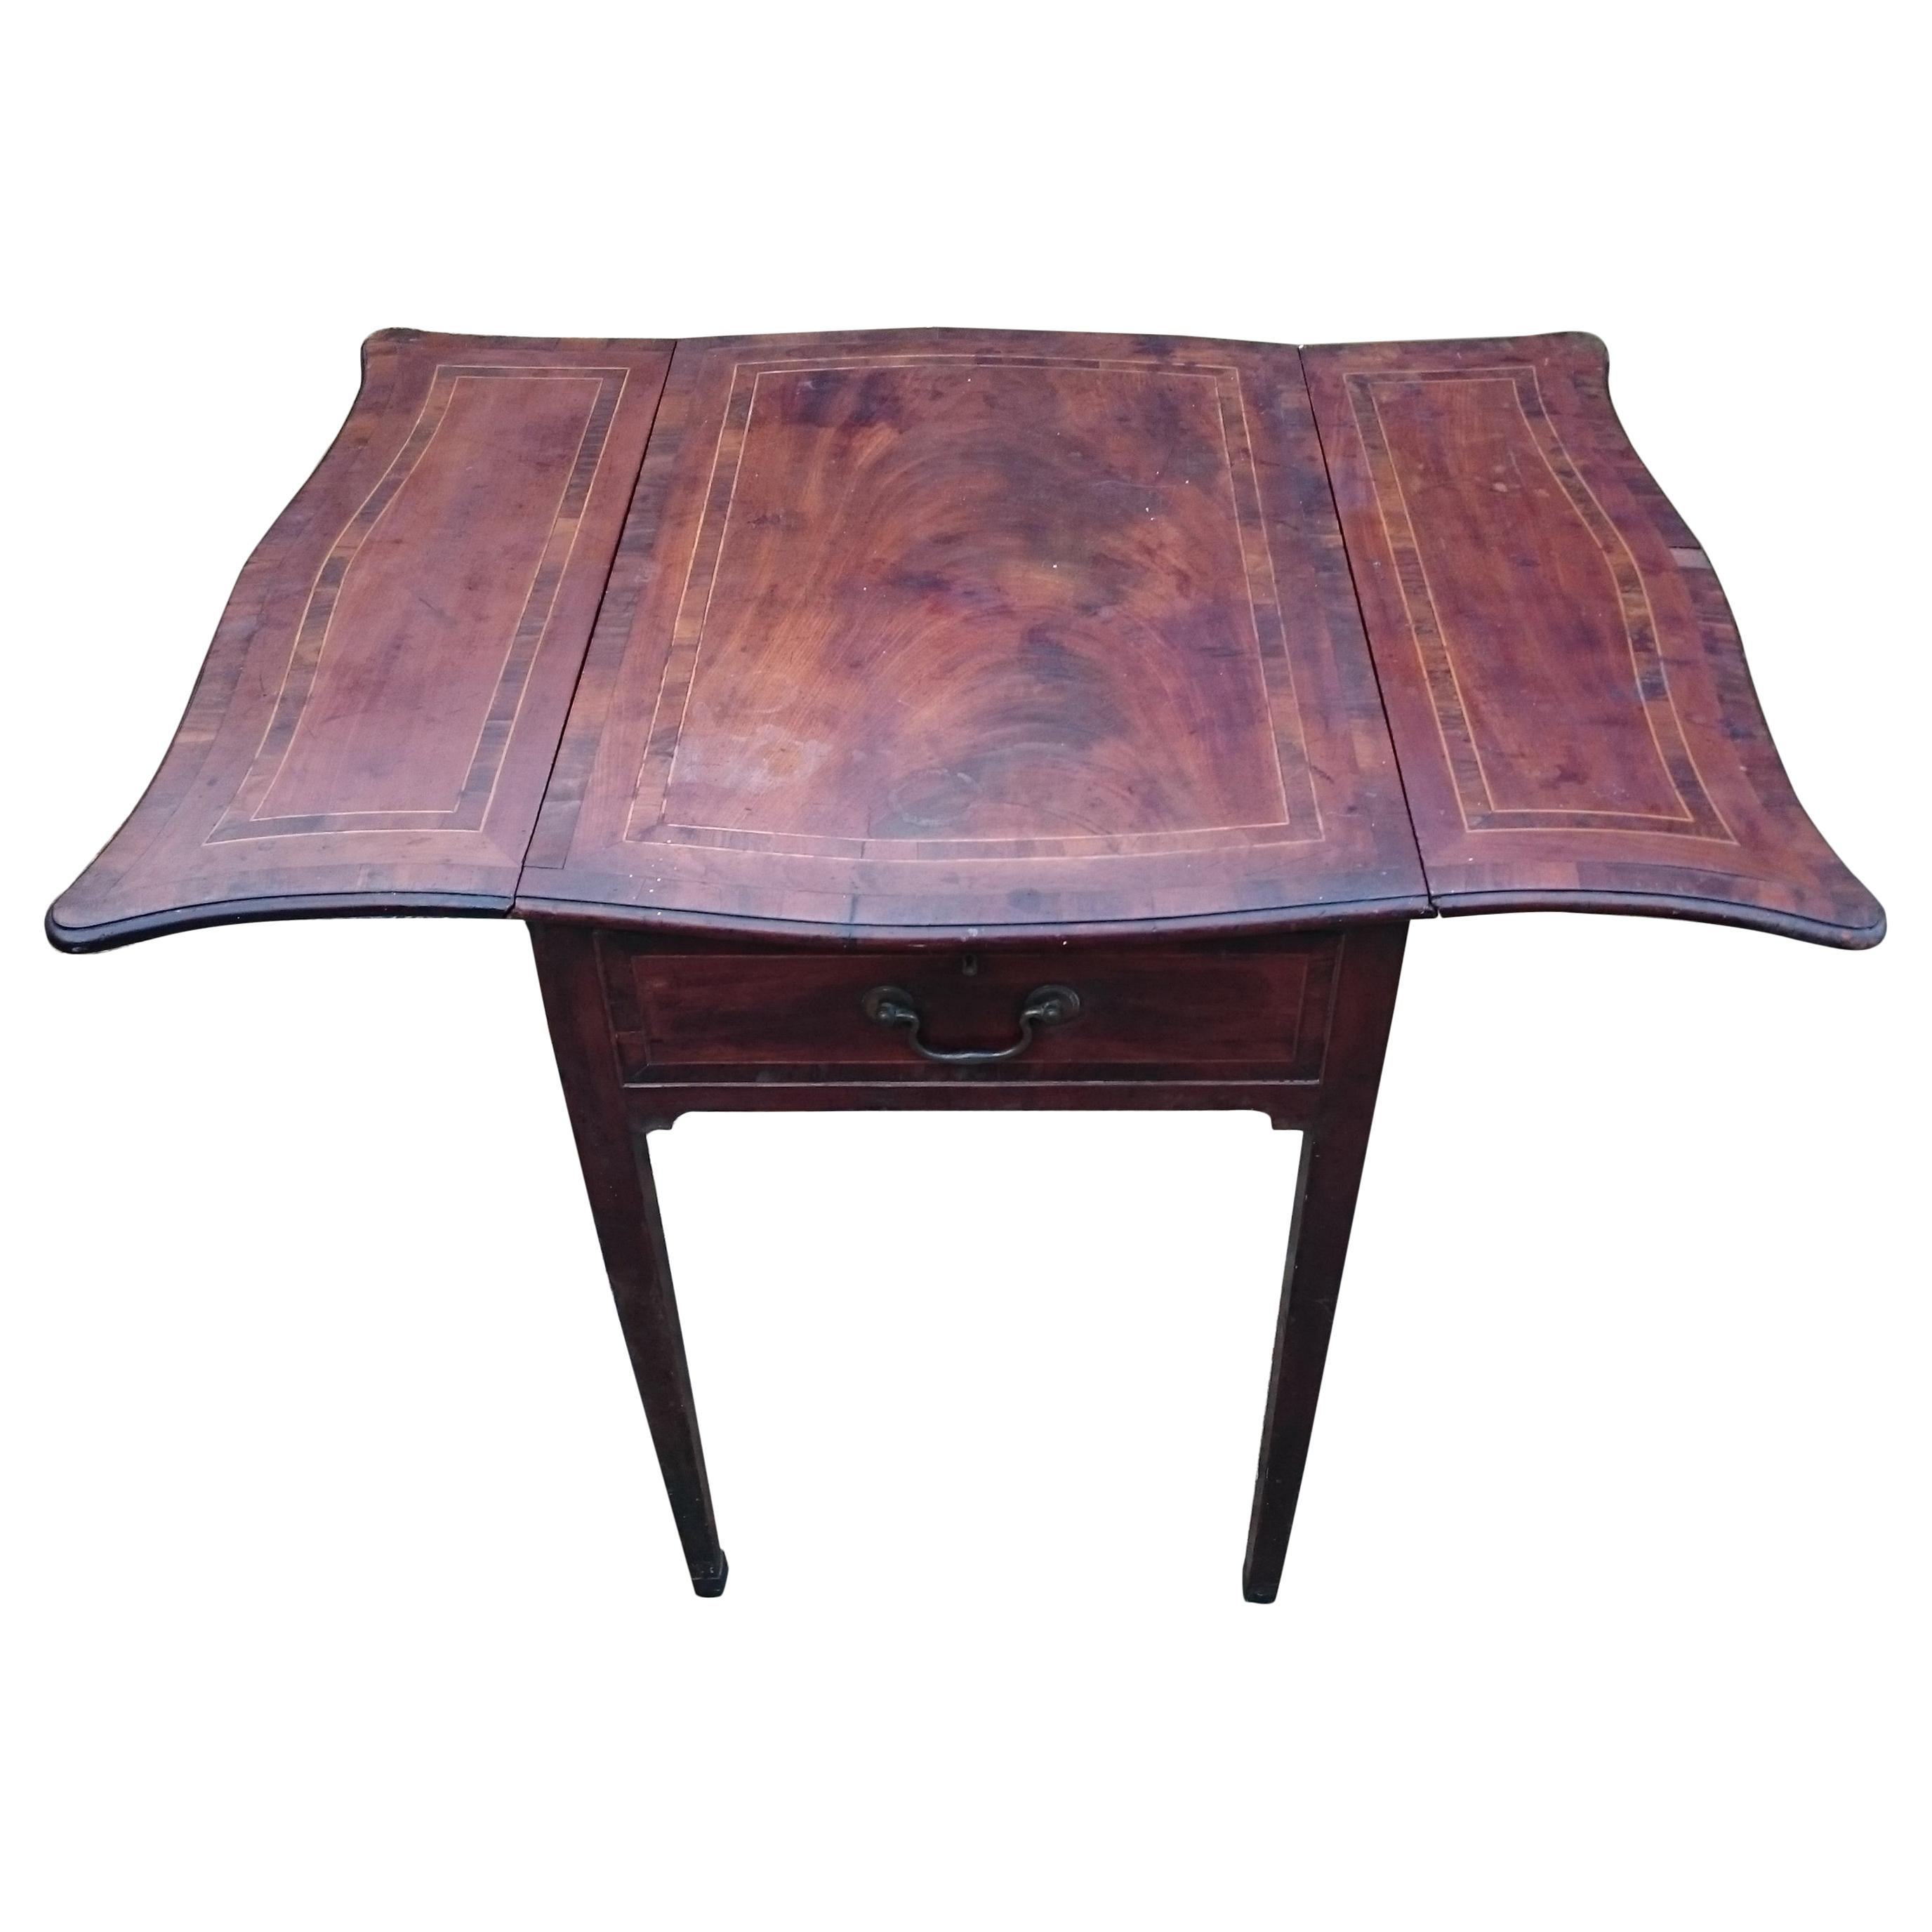 18th Century George III Period Mahogany Pembroke Table